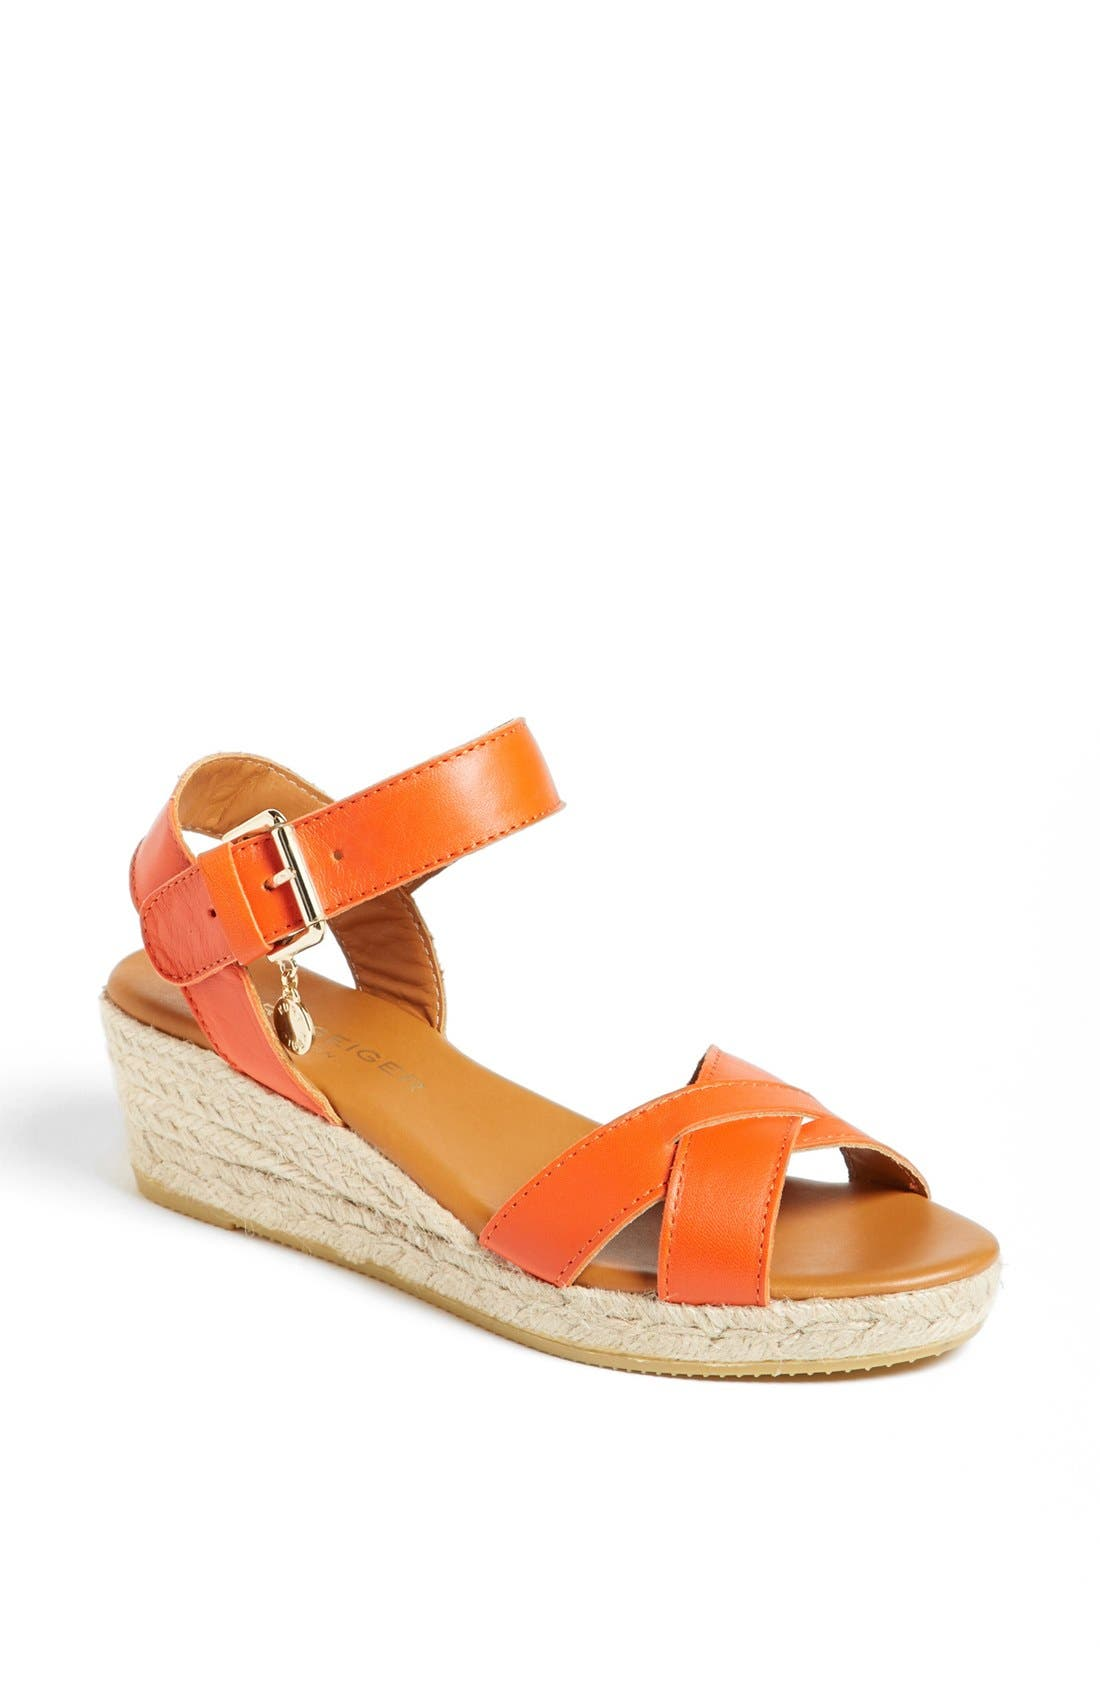 Alternate Image 1 Selected - Kurt Geiger London 'Libby' Leather Sandal